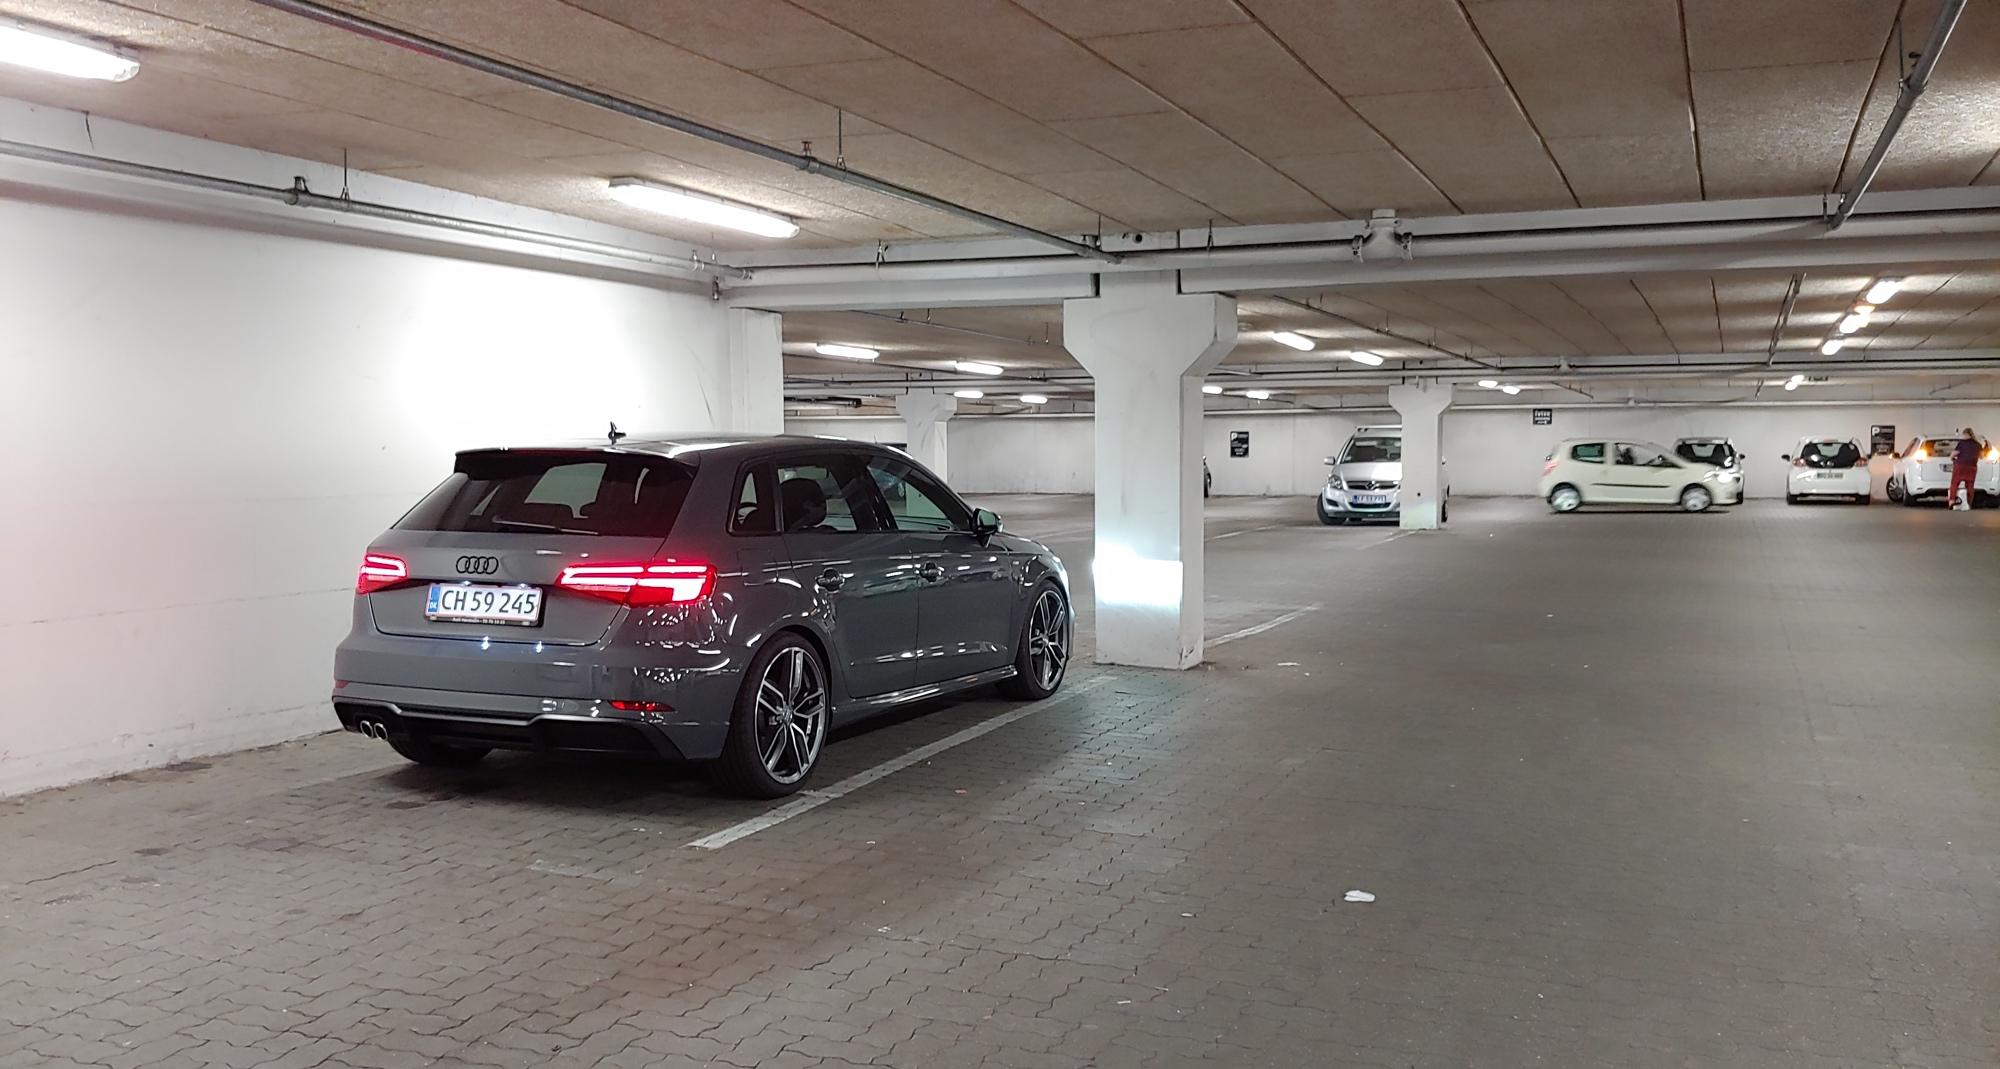 Extreme parking 3.jpg